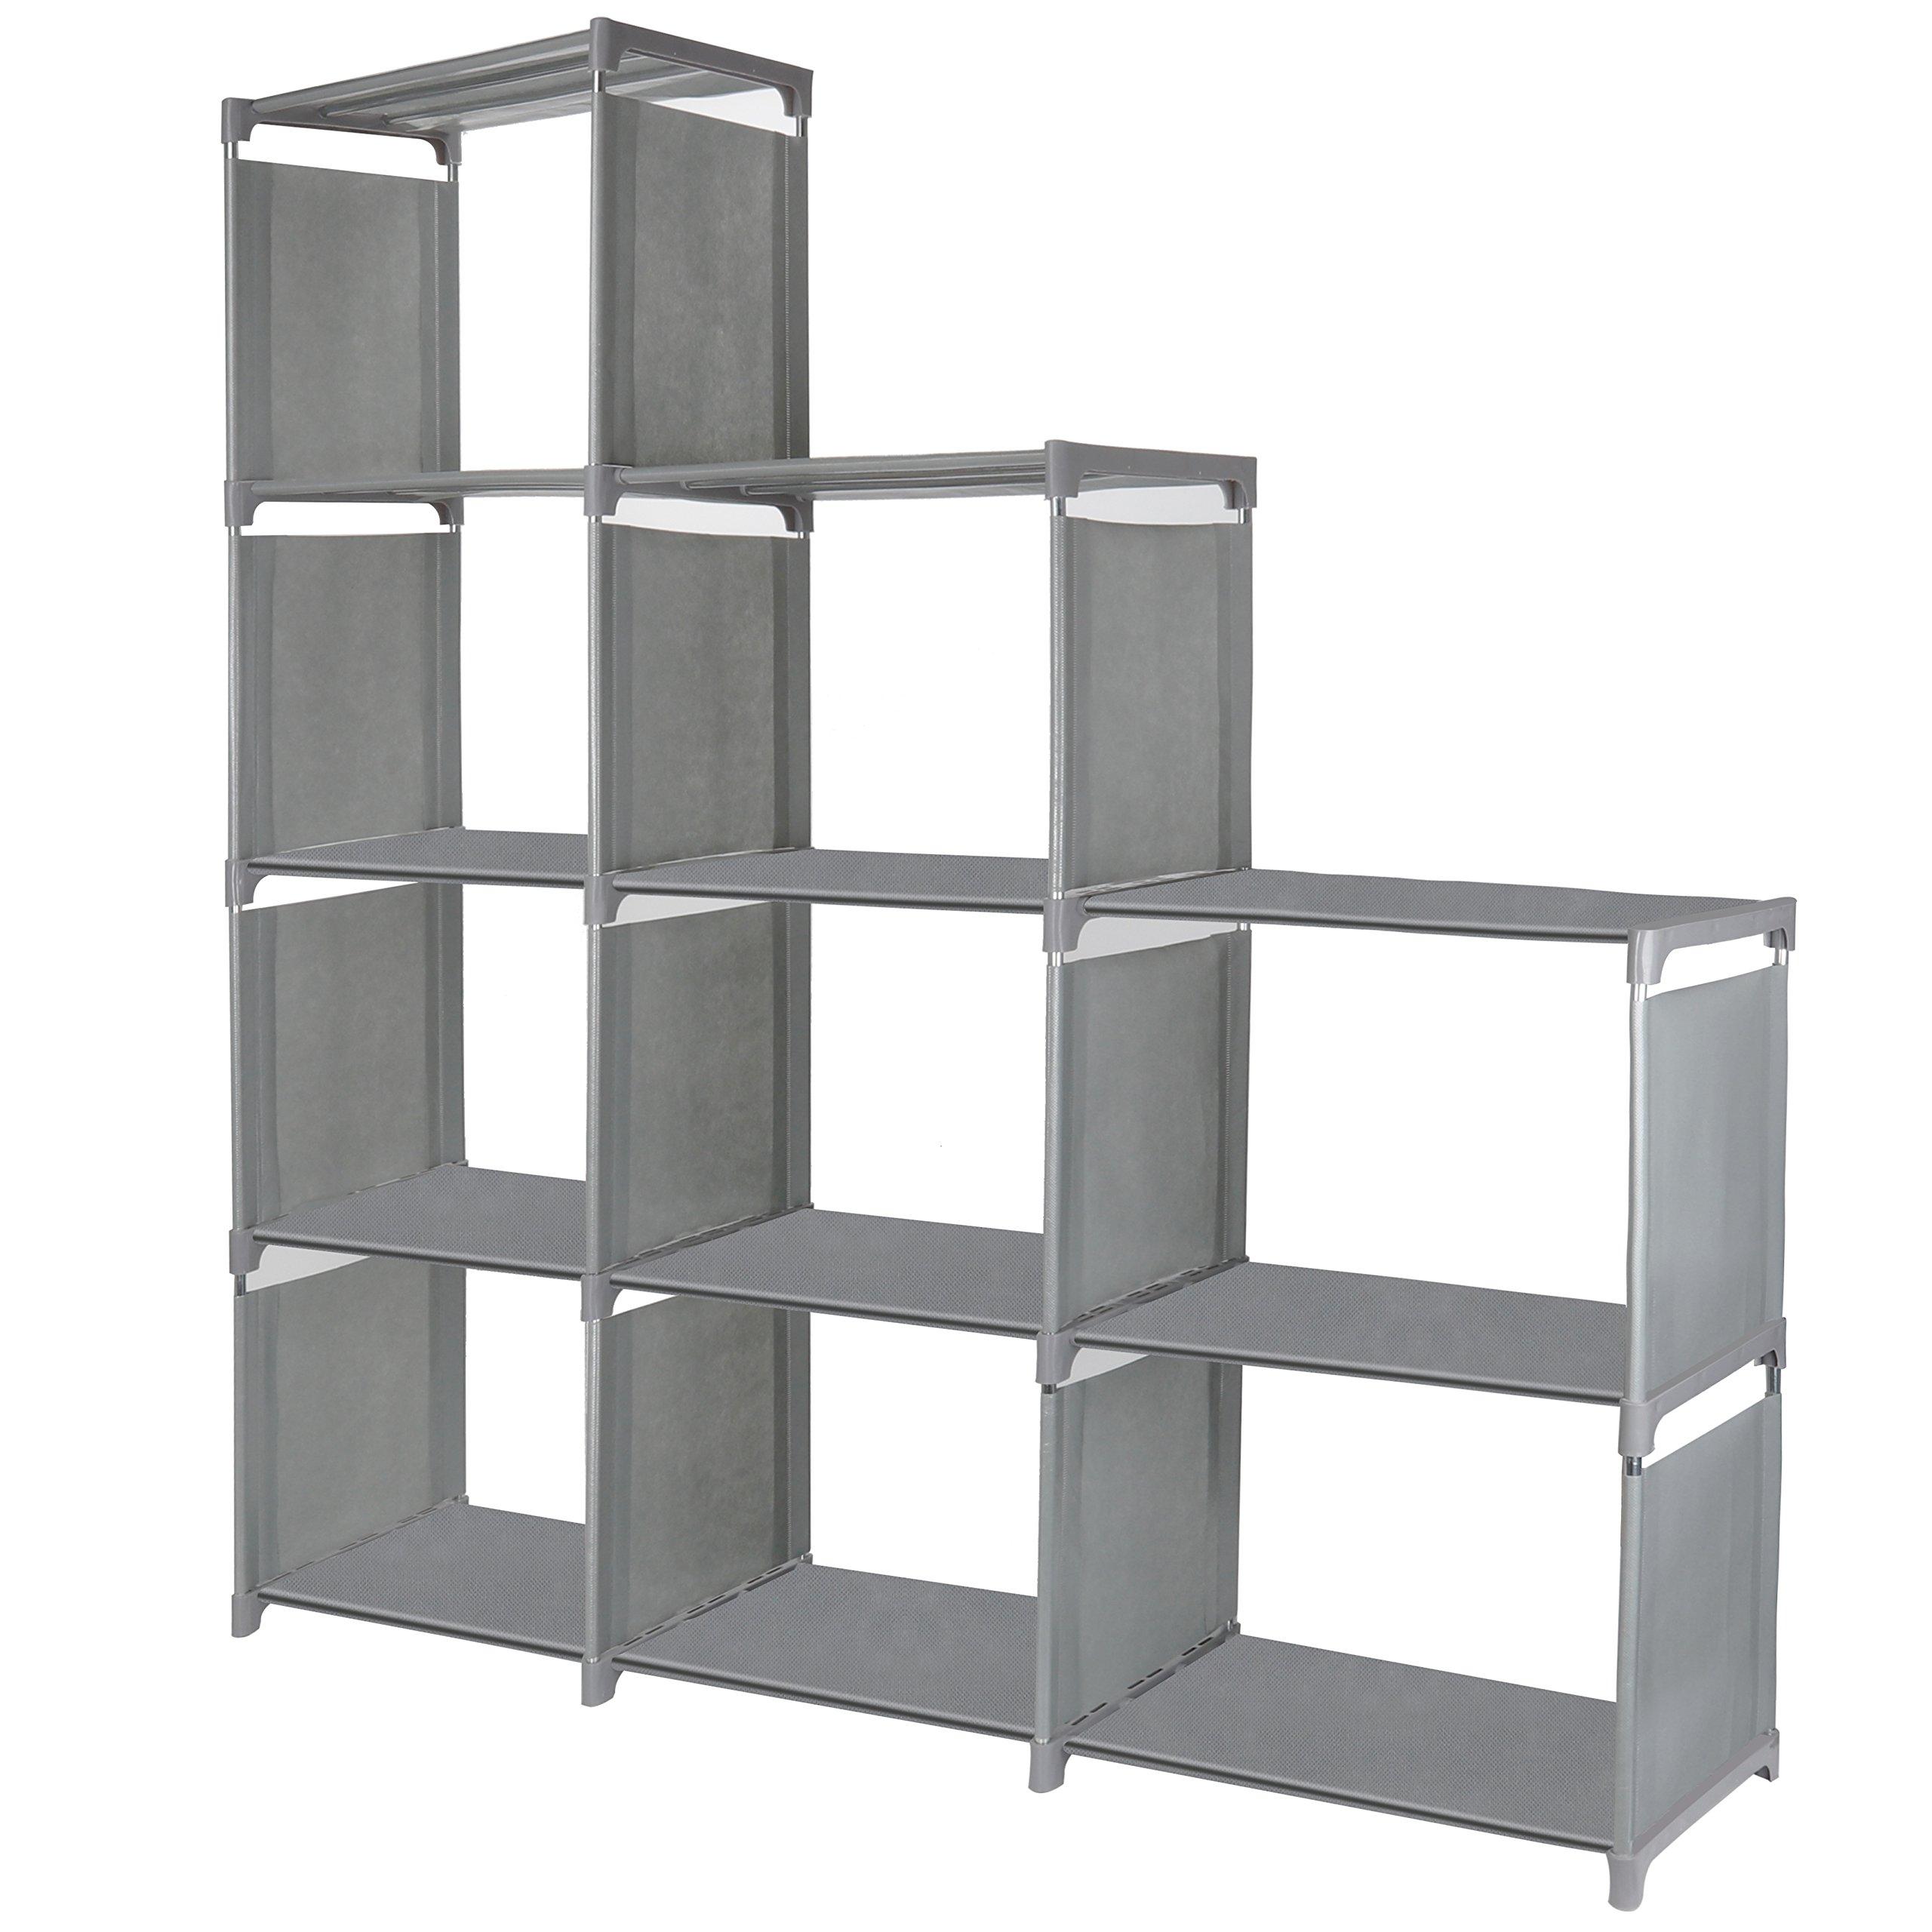 9 Cube Storage Shelves, SJHL DIY Modular Closet Organizer Unit and Bookshelf Cabinet for Clothes, Toys, Books and Shoes (Grey)